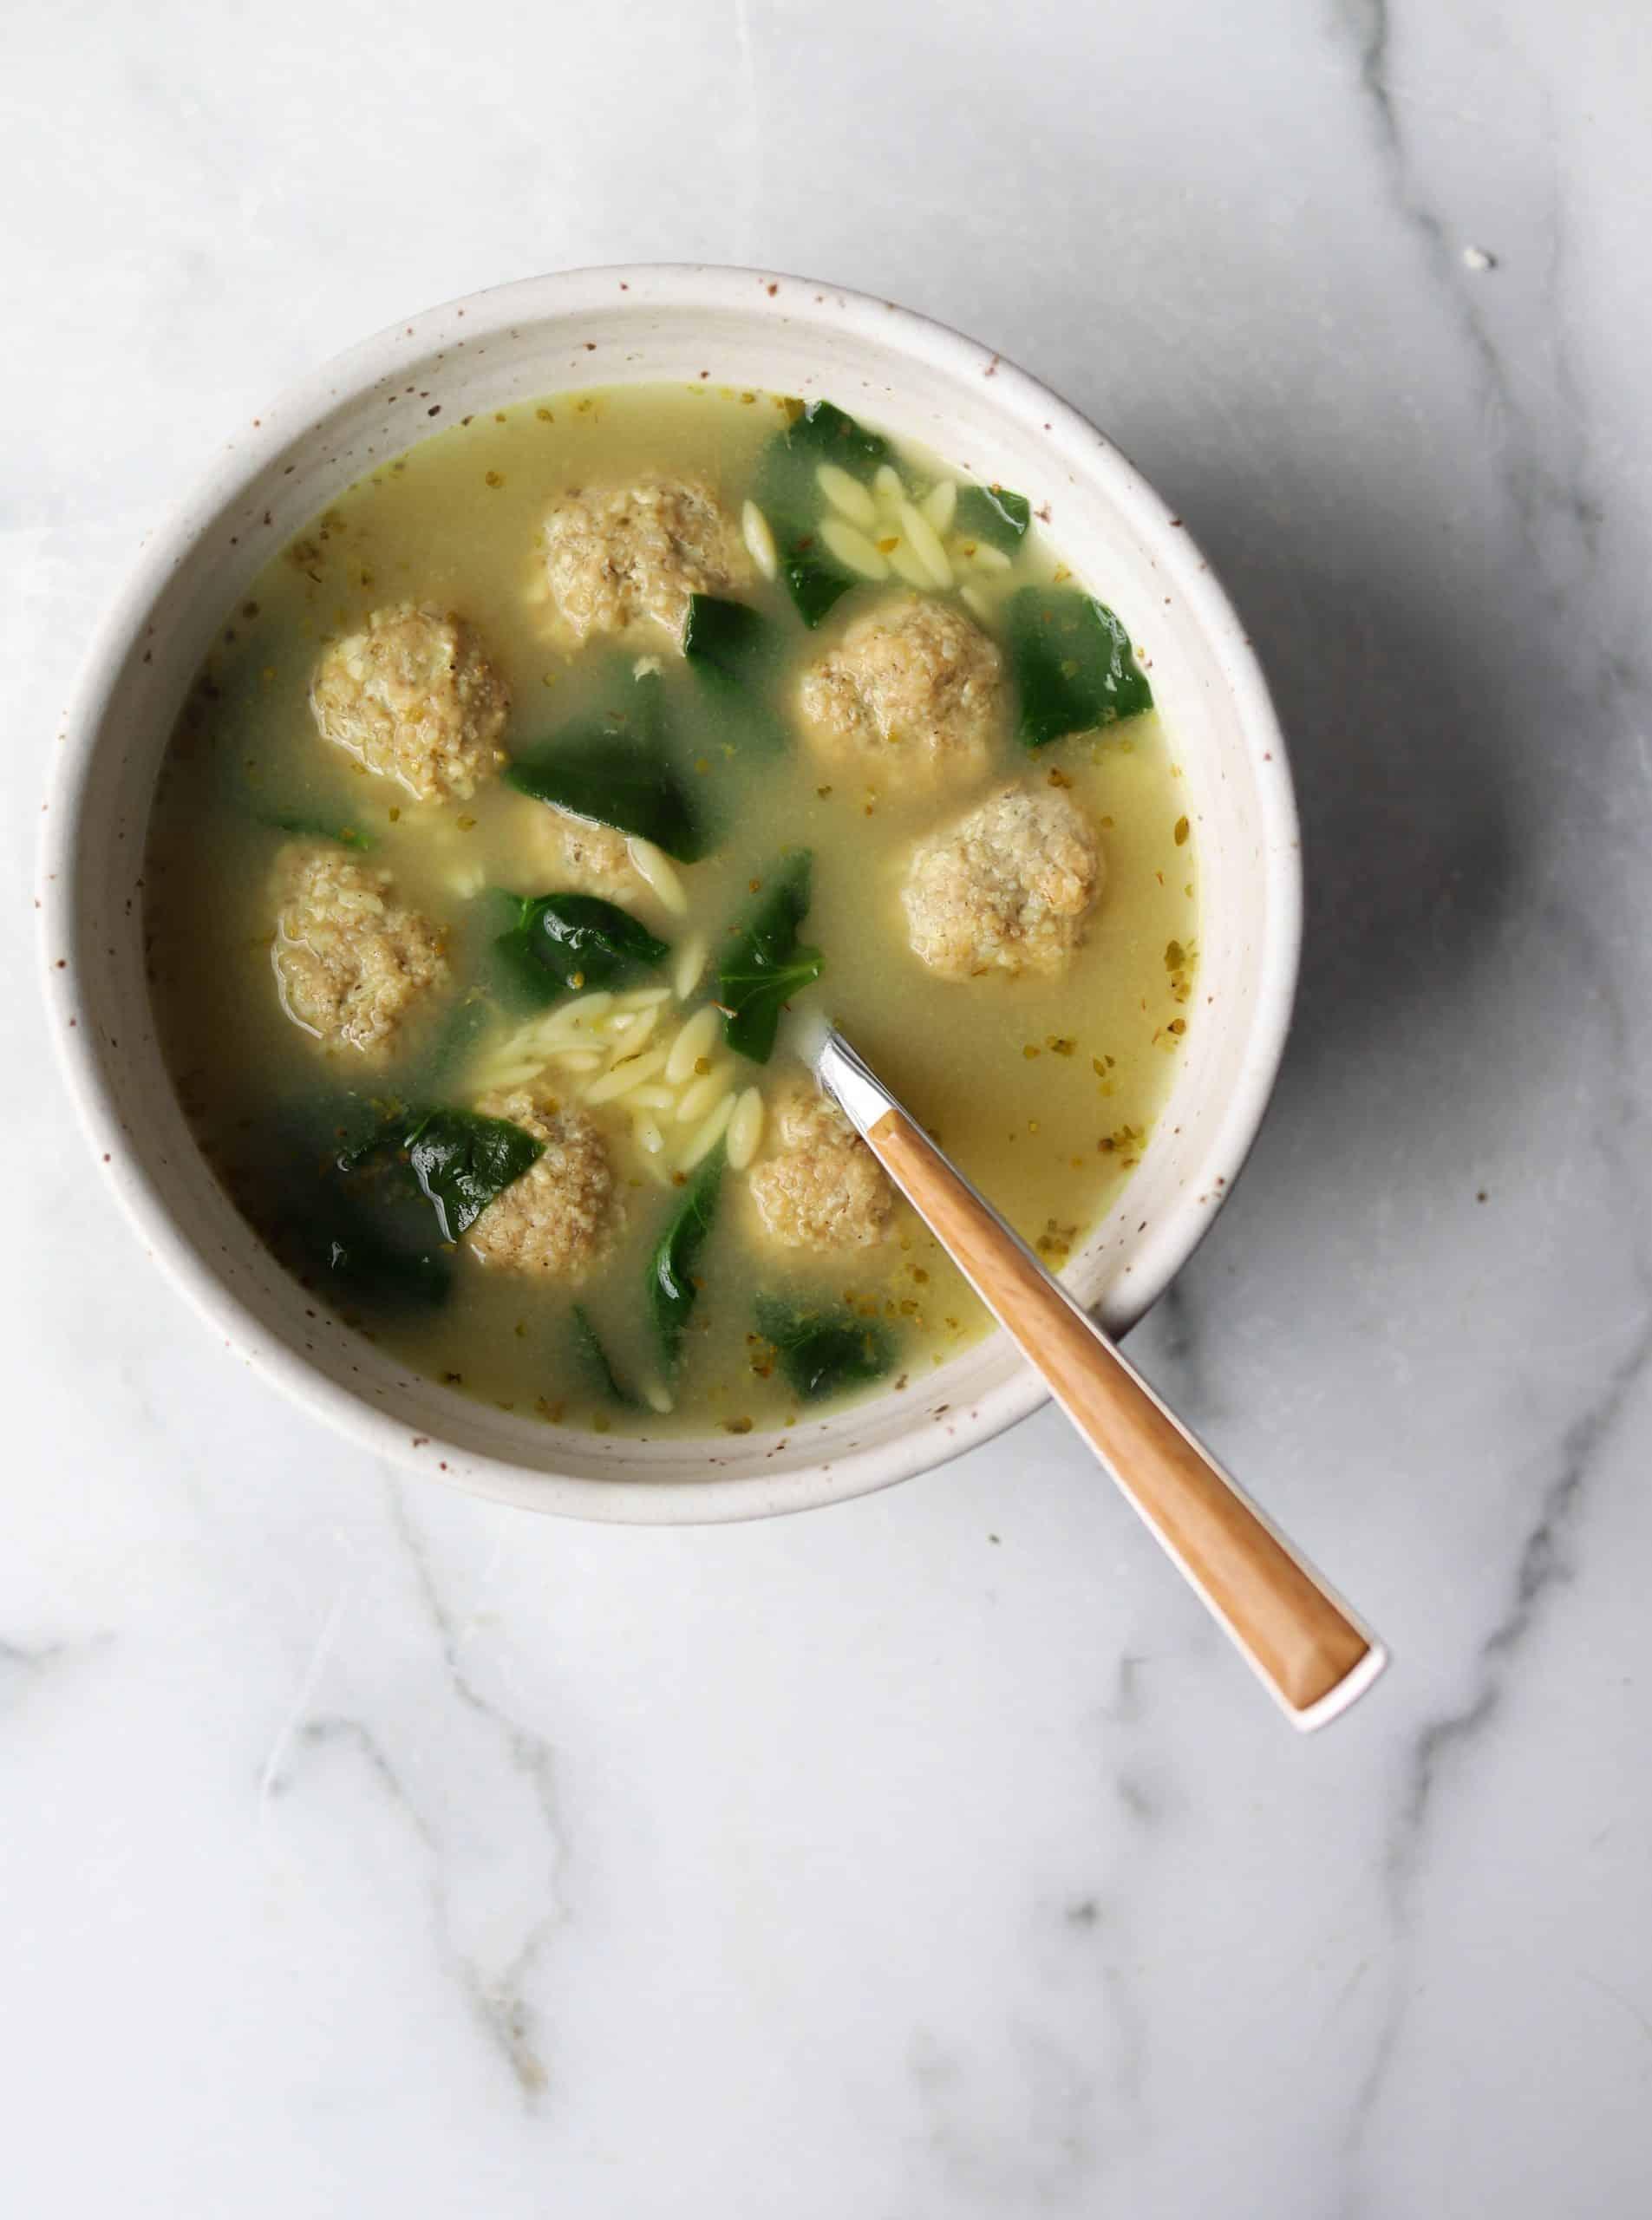 Italian wedding soup in a white pot